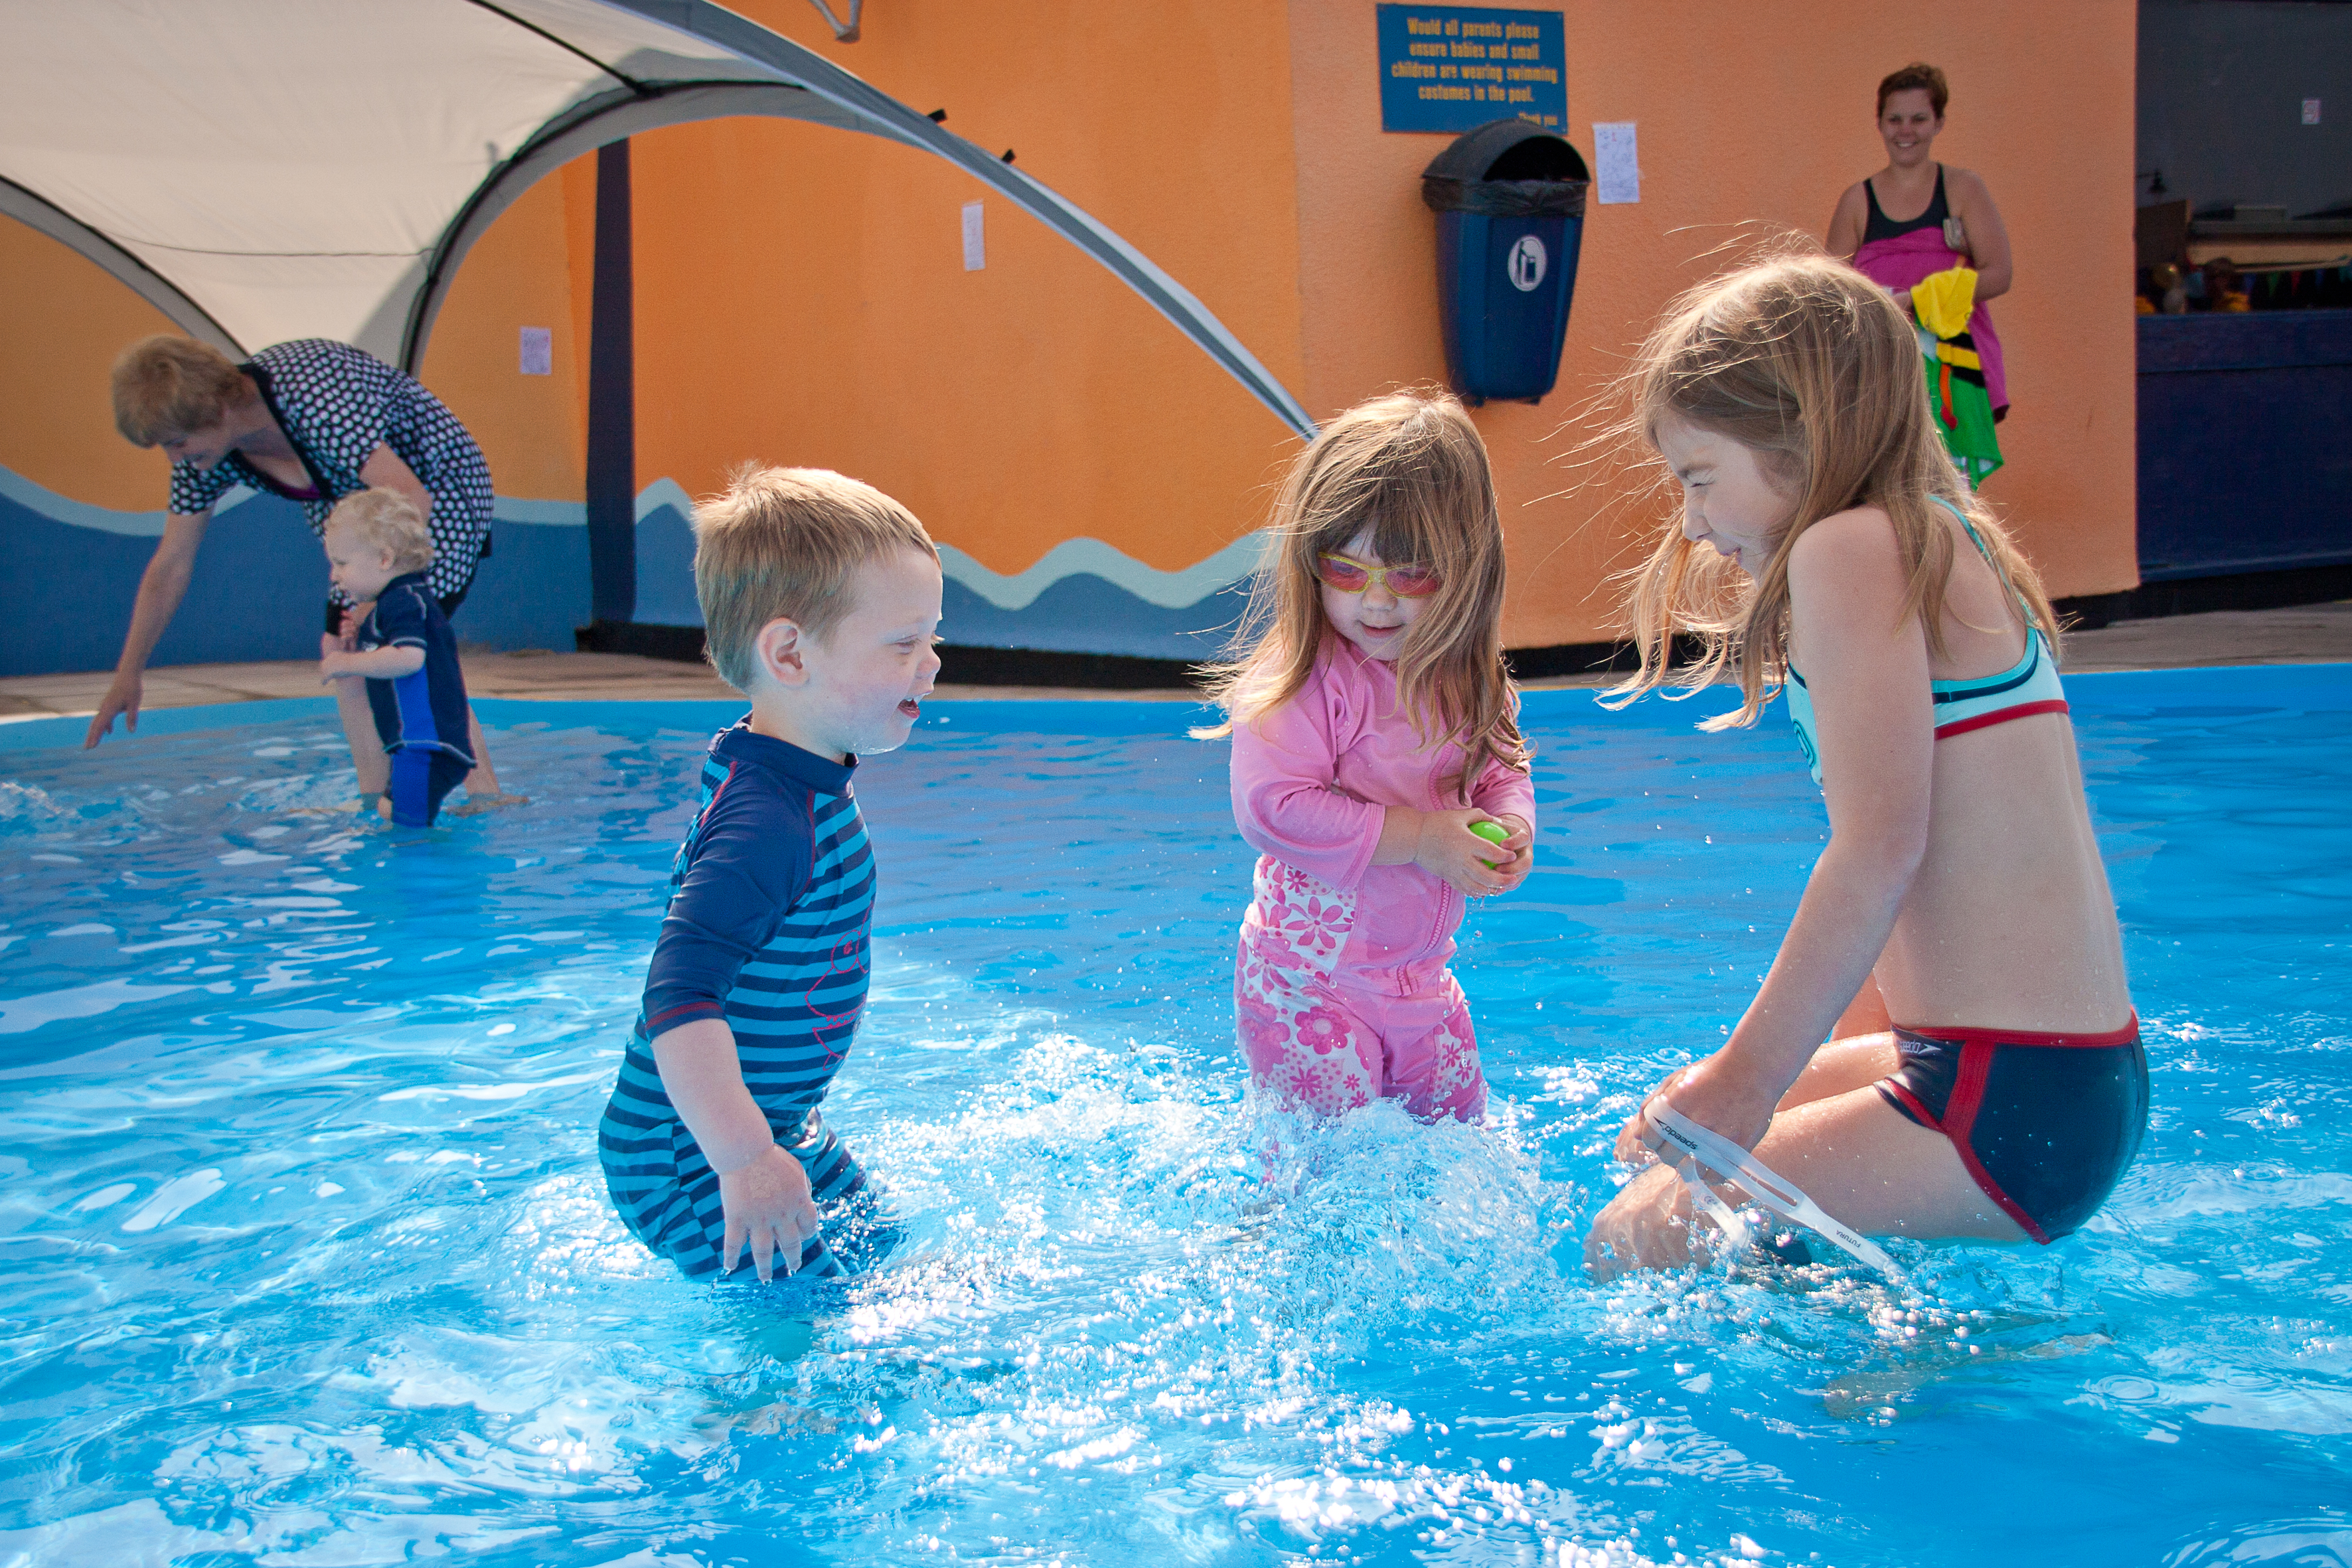 Toddler pool portishead open air pool portishead open - Open air swimming pool portishead ...